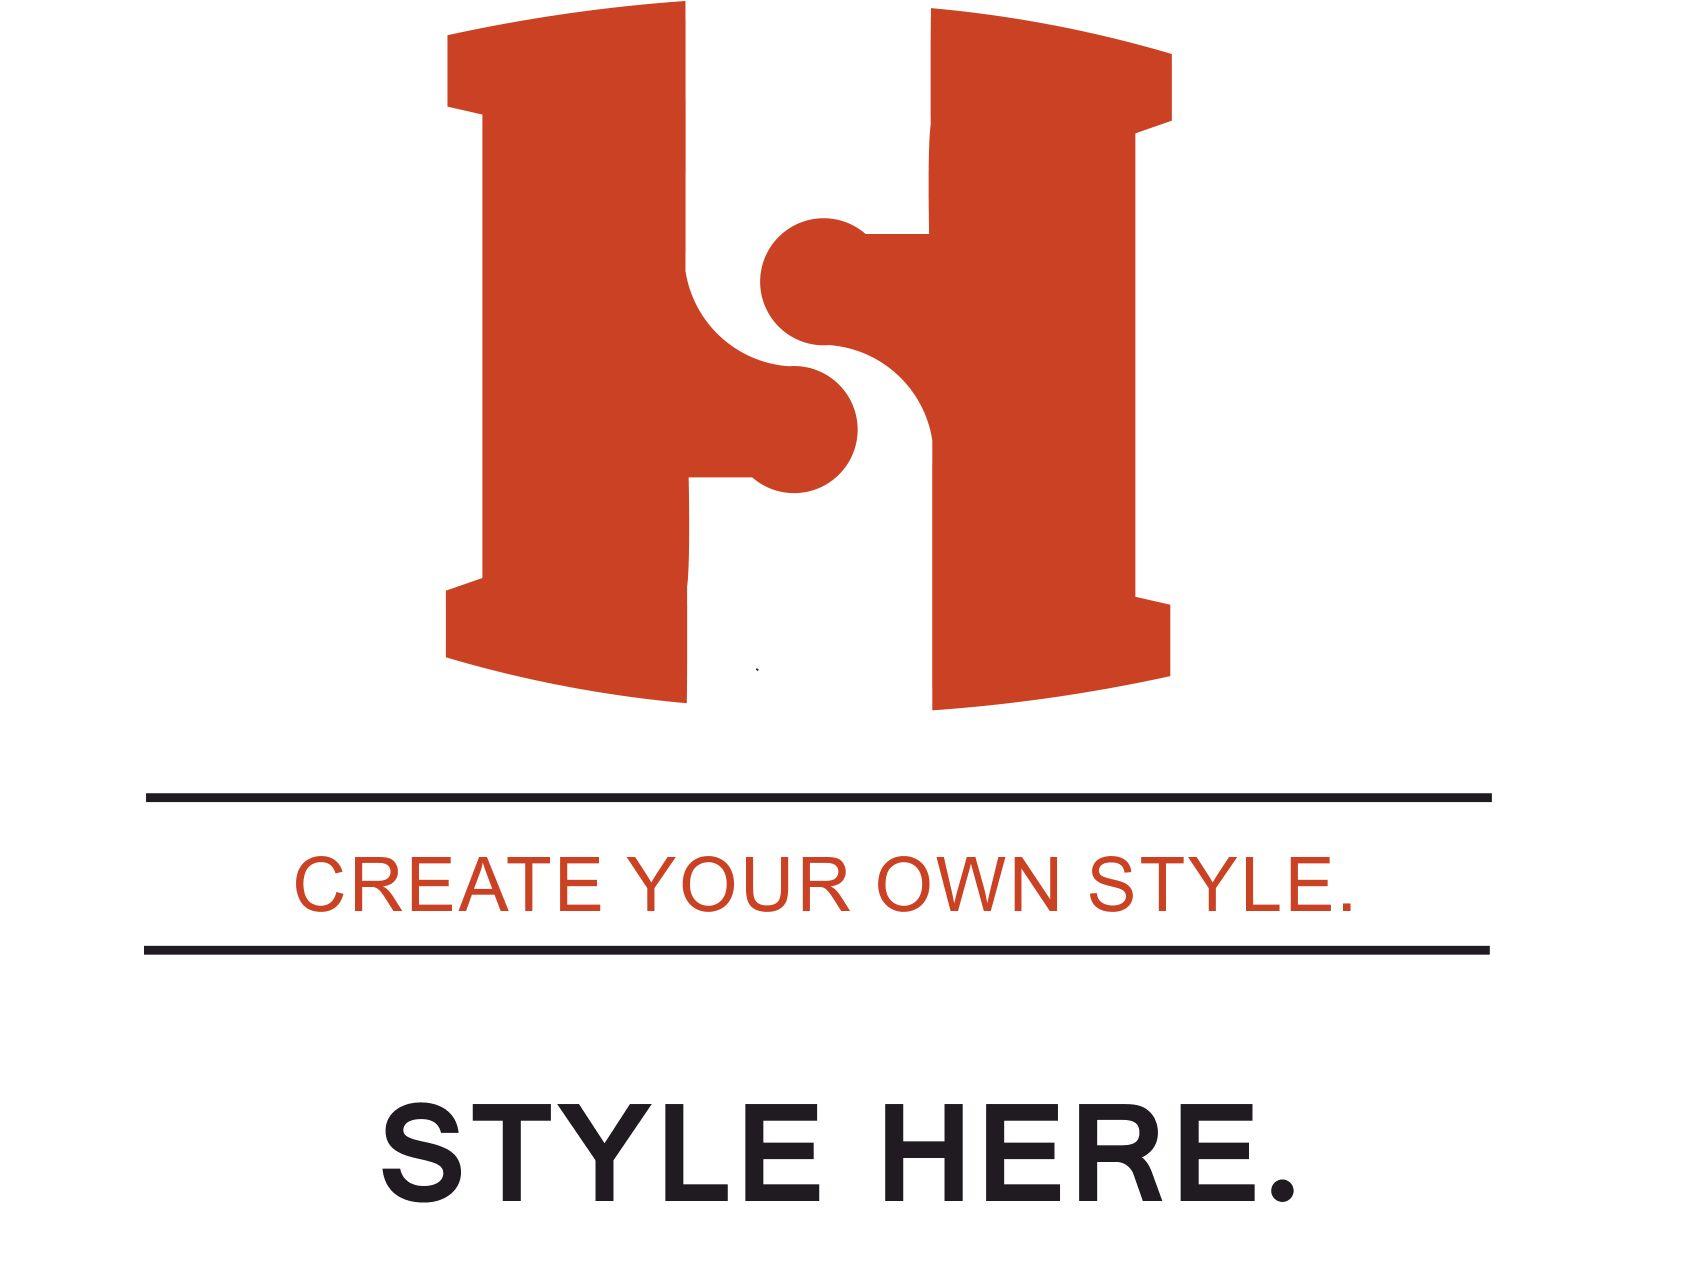 Логотип для интернет-магазина stylehere.ru - дизайнер Askar24